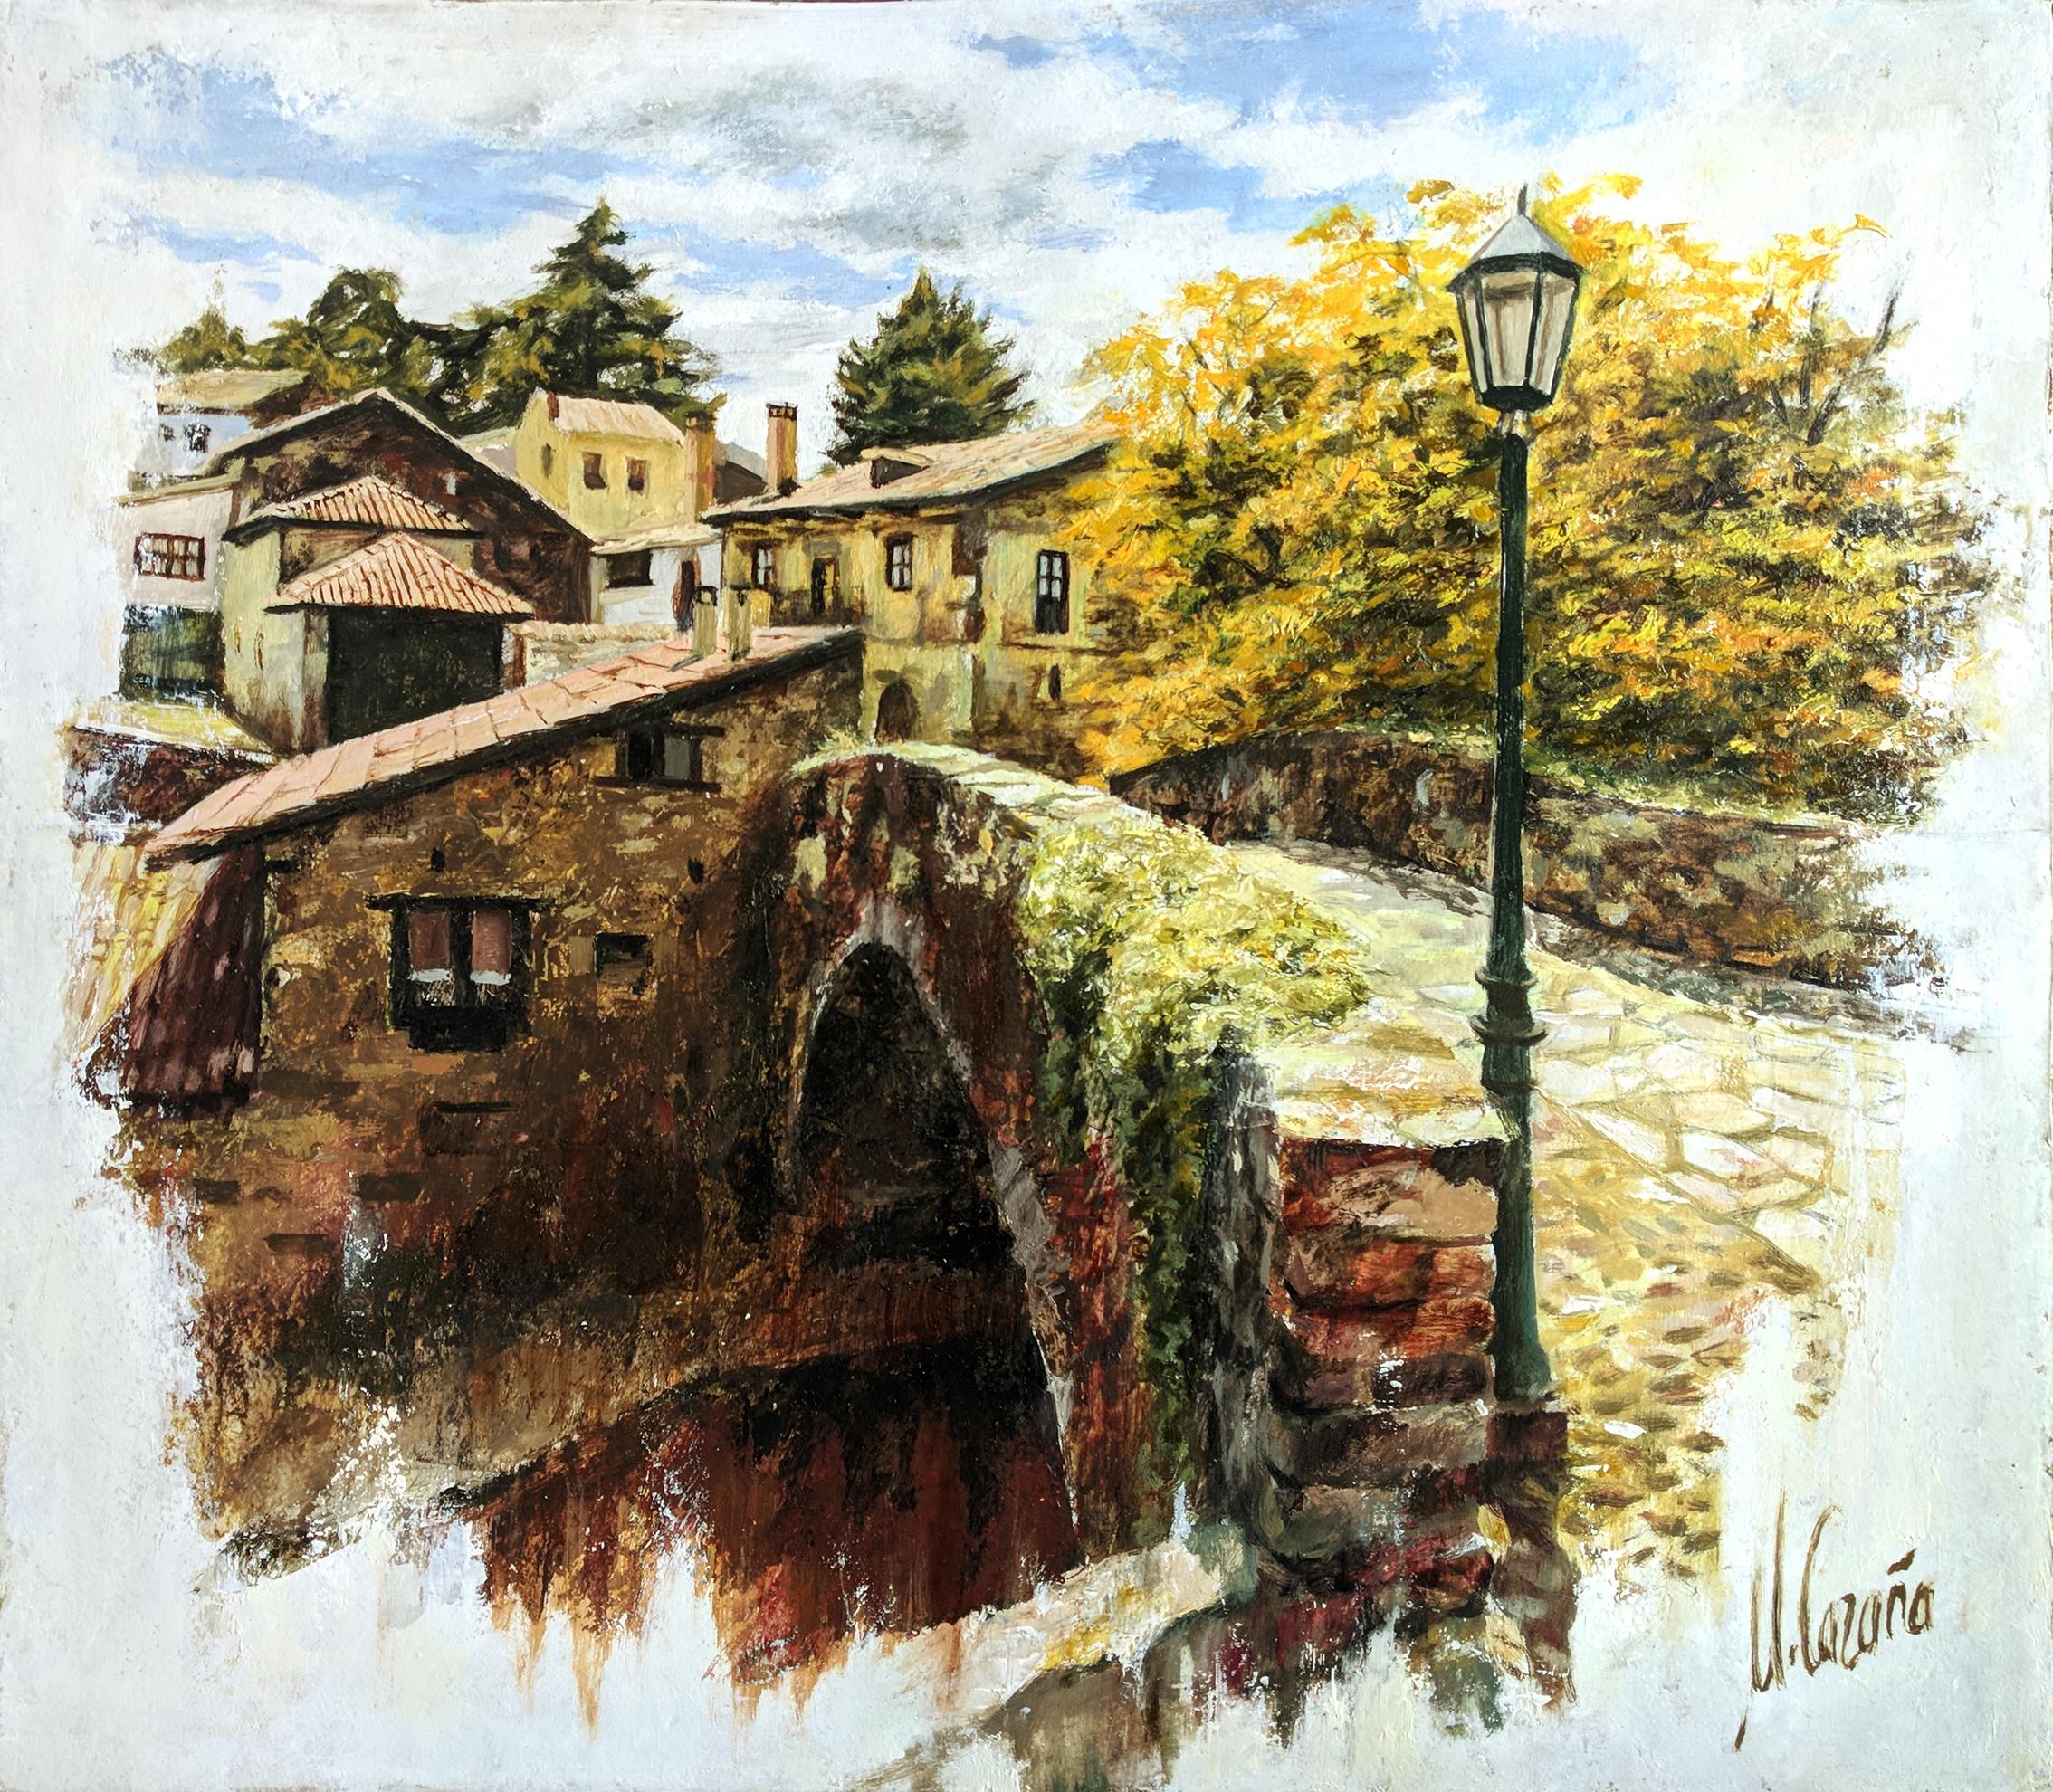 Potes - Cantabria